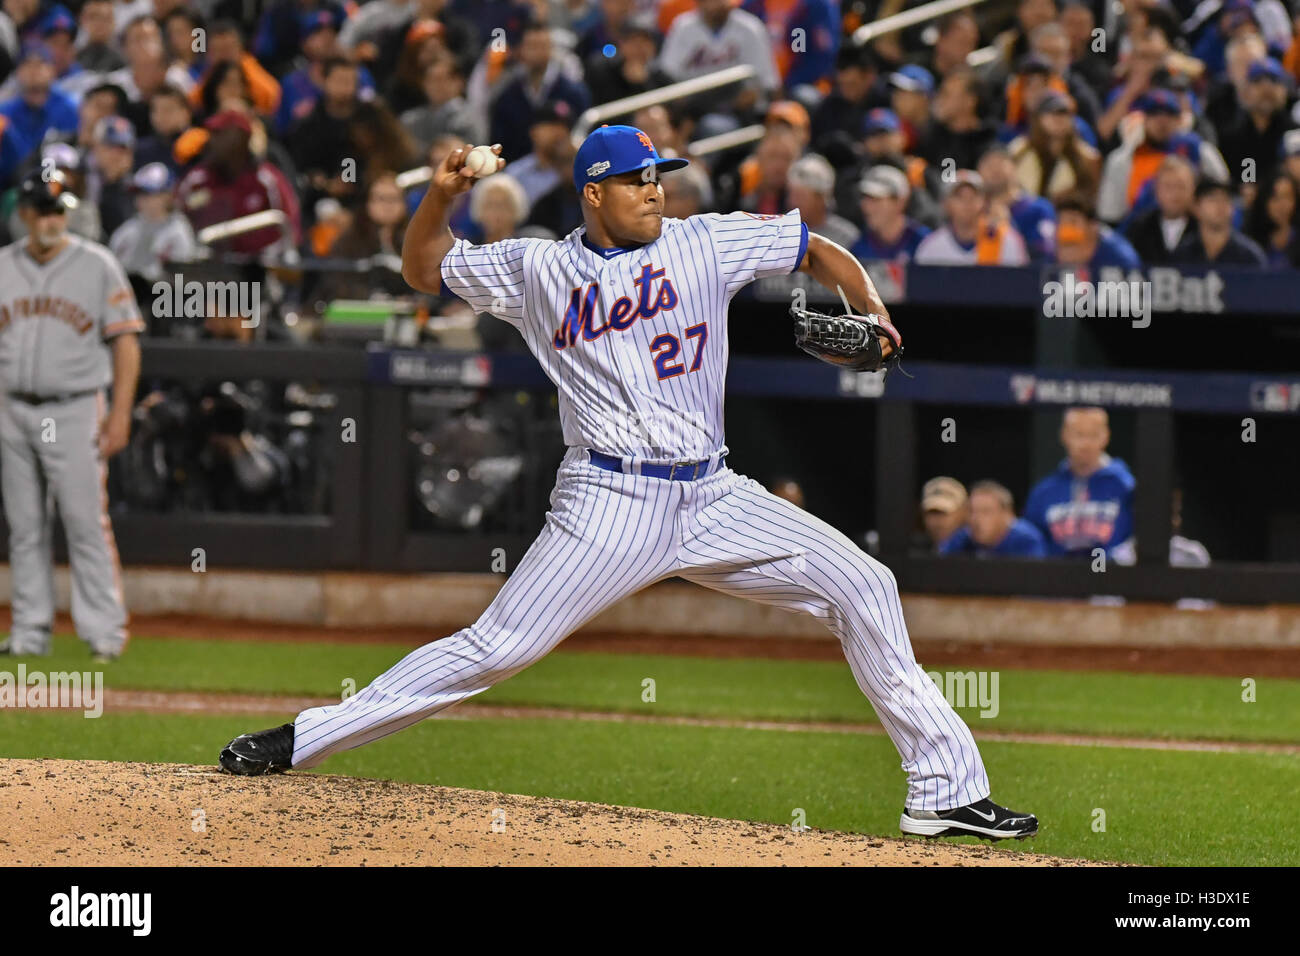 Flushing, New York, USA. 5th Oct, 2016. Jeurys Familia (Mets) MLB : Jeurys Familia of the New York Mets pitches Stock Foto